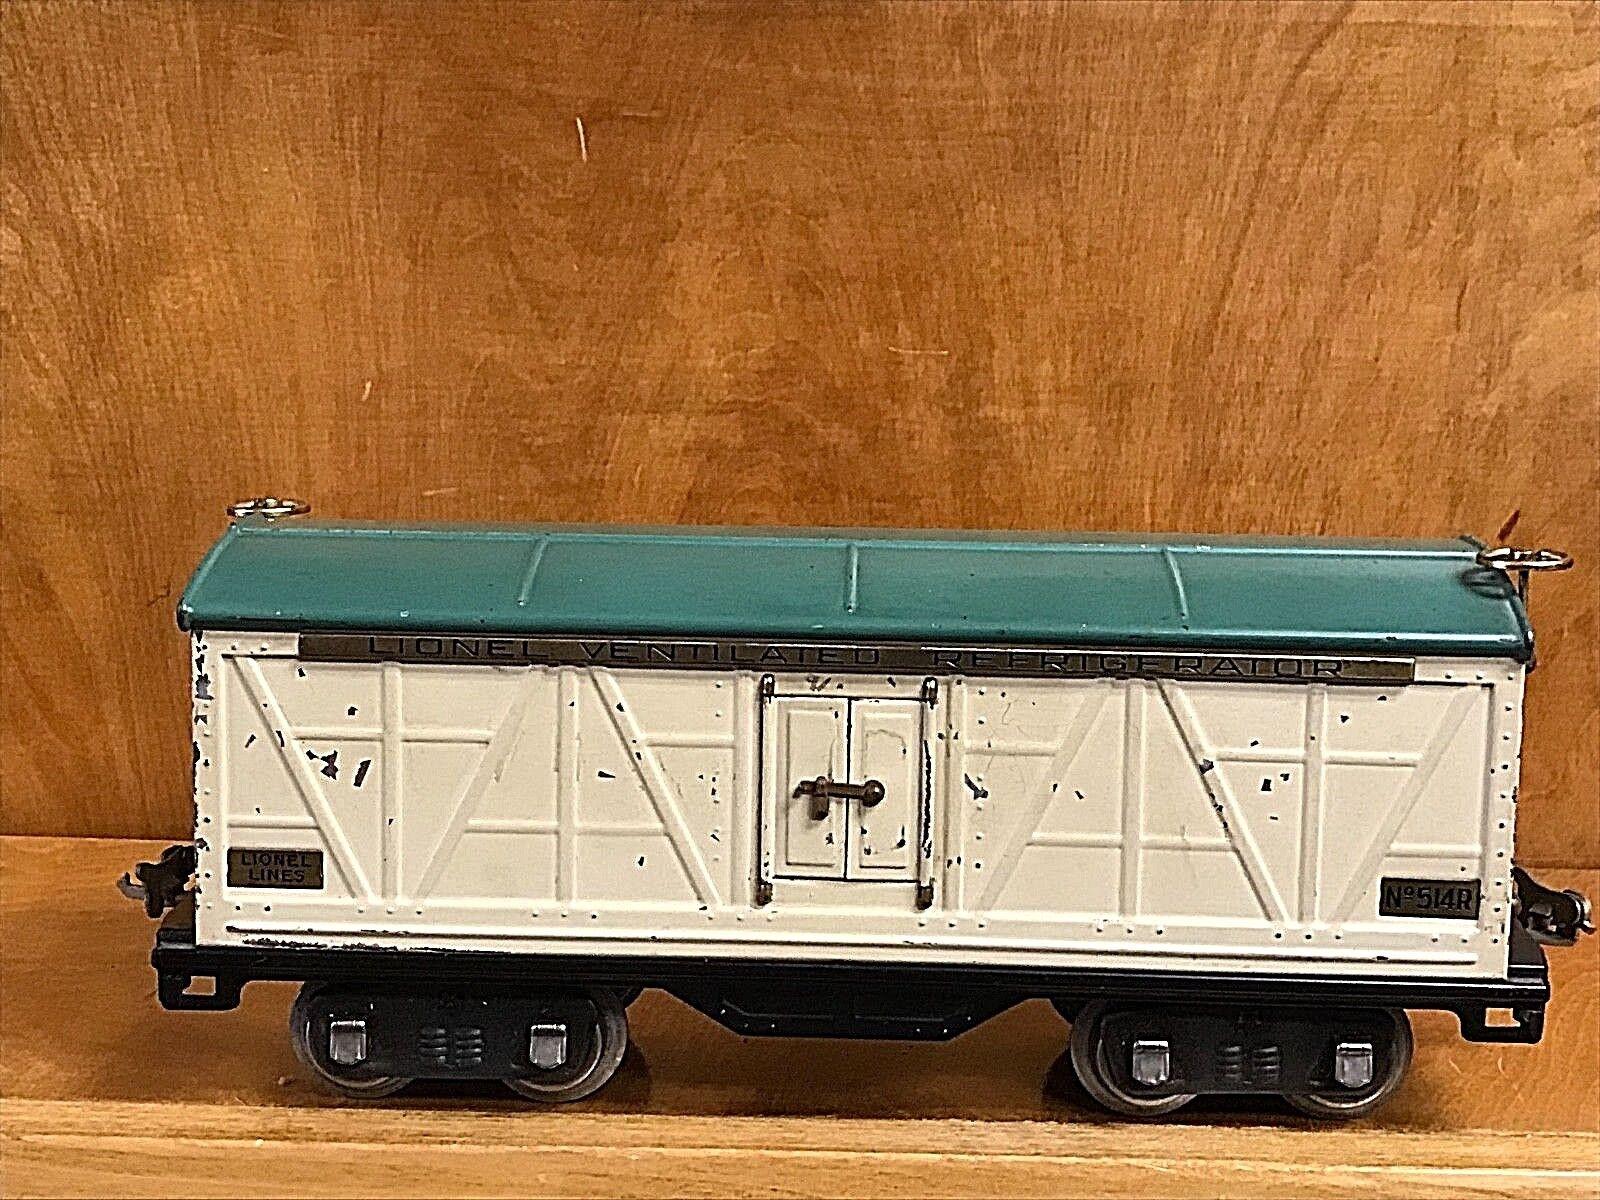 Lionel klassiker 1217 200 reihe roter dienstwagen 6-13702